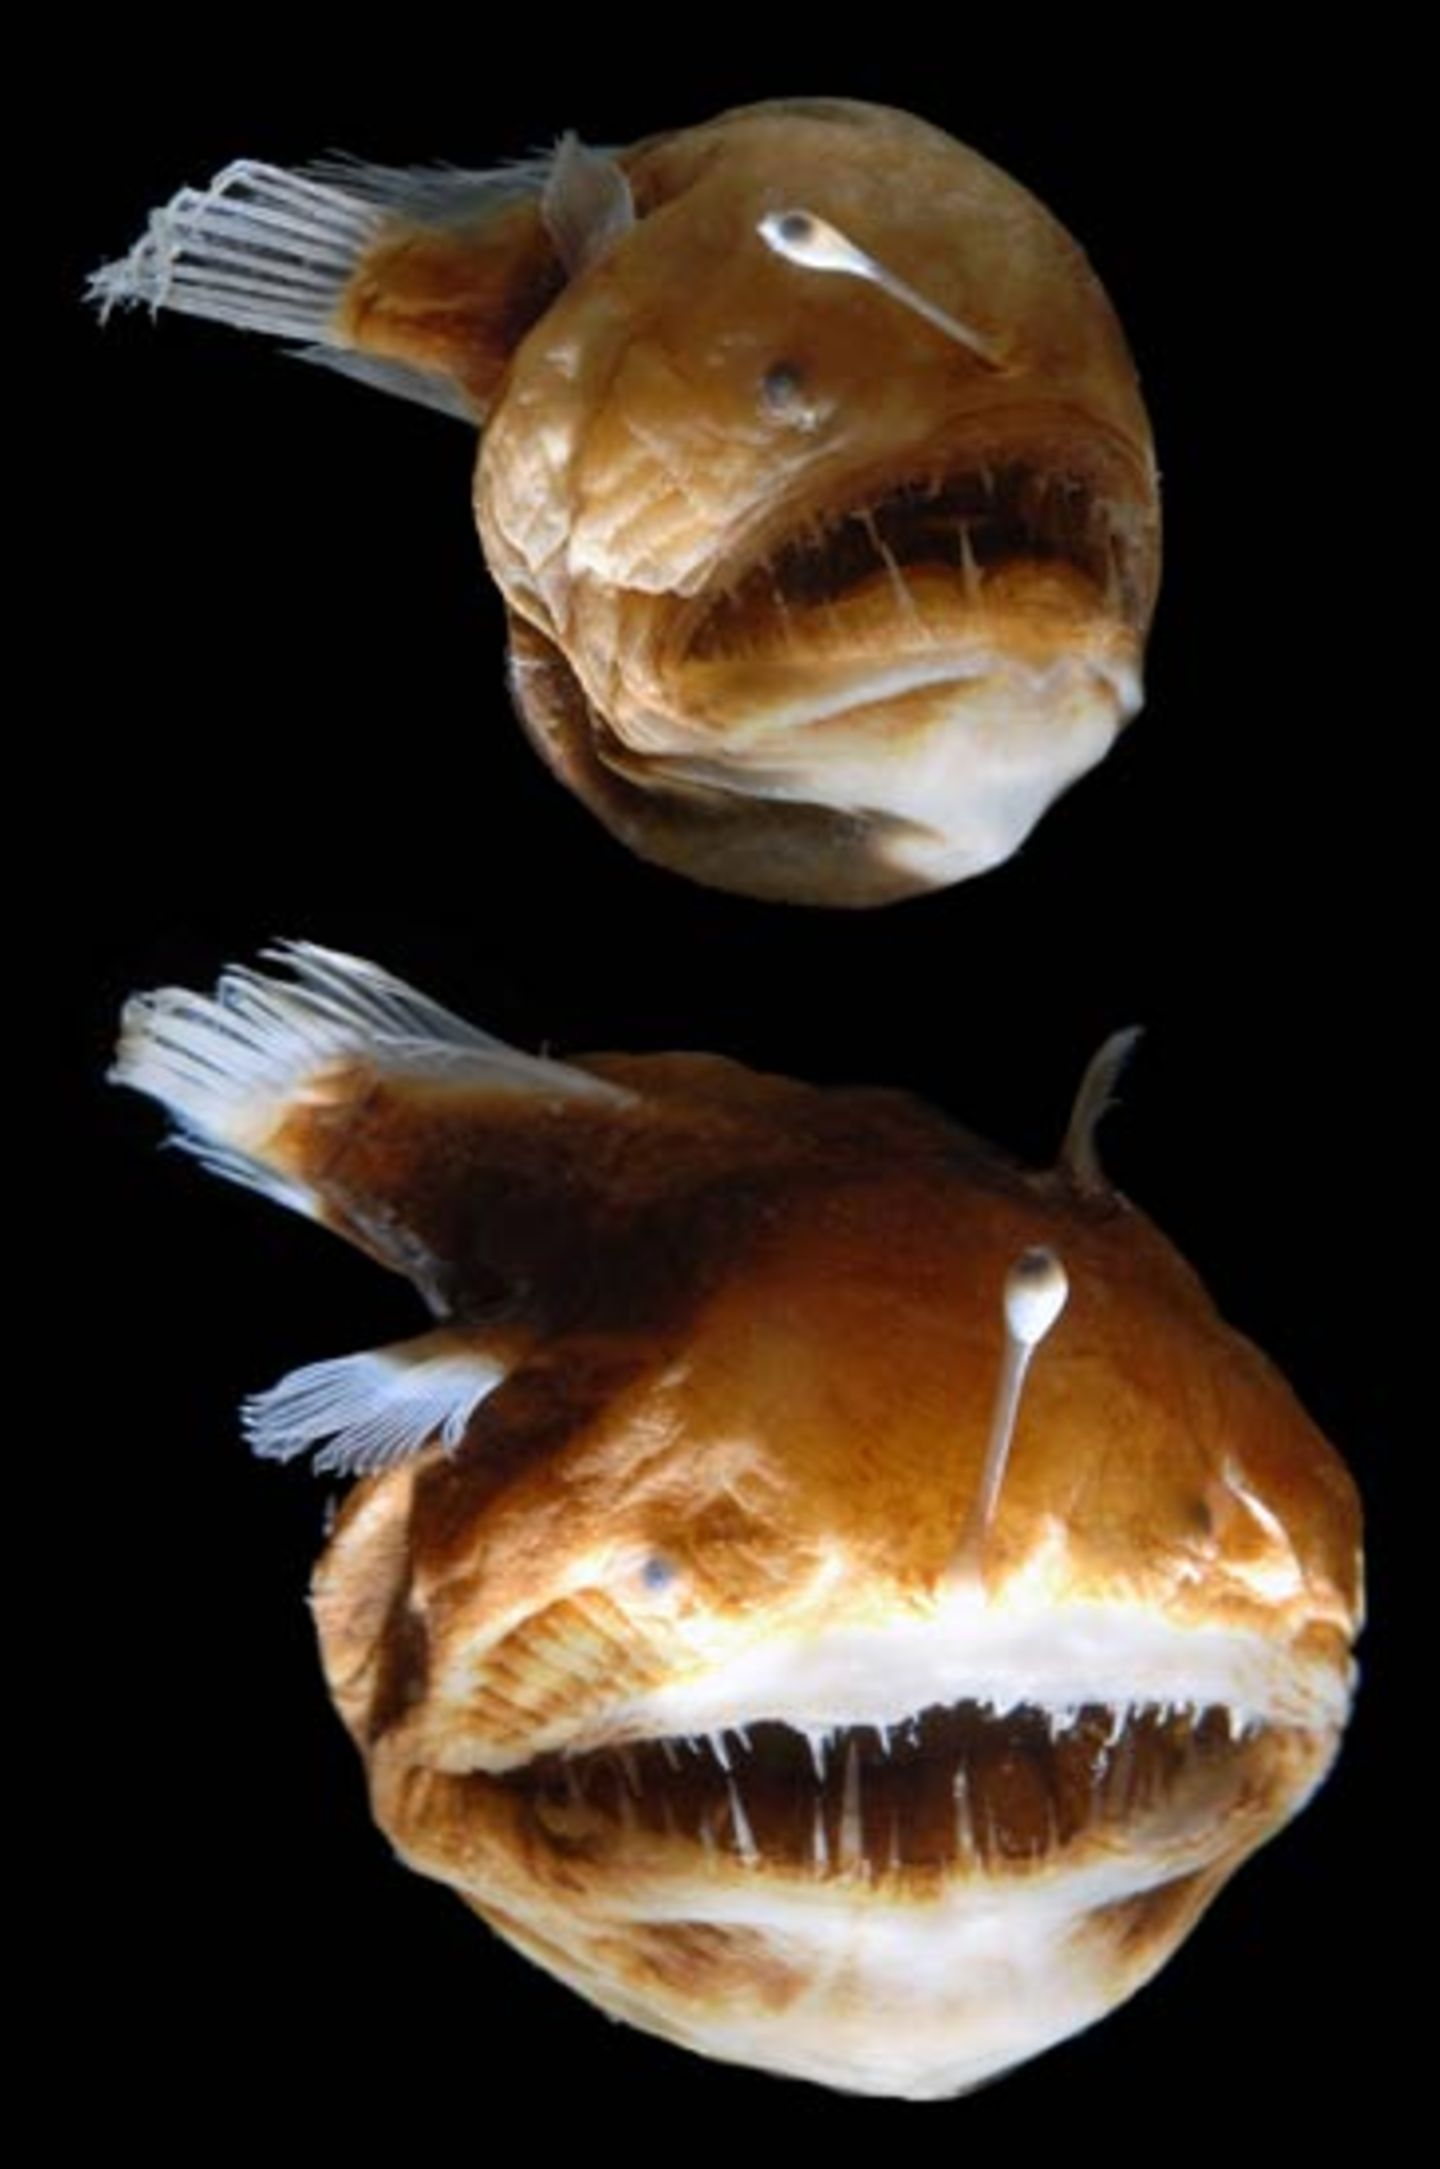 Fotoshow: Kreaturen der Tiefe - Bild 9